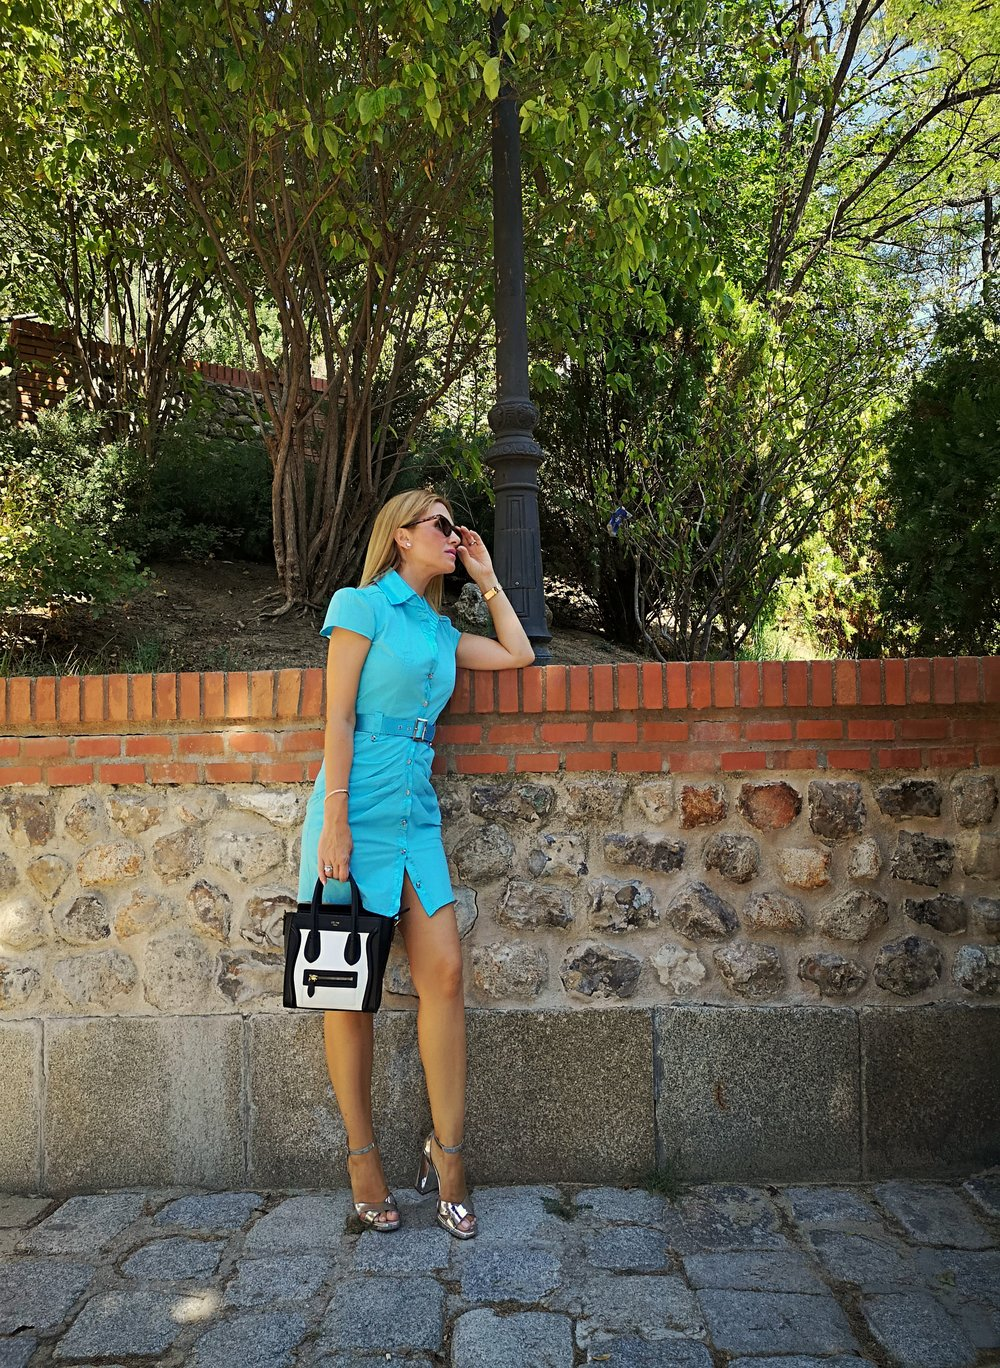 OUTFIT DETAILS: Dress: BEBE; Necklace: SWAROVSKI; Bracelet: SWAROVSKI; Sunnies: STRADIVARIUS; Sandals: Stradivarius (sales); Handbag: CÉLINE; Swatch: MAREA